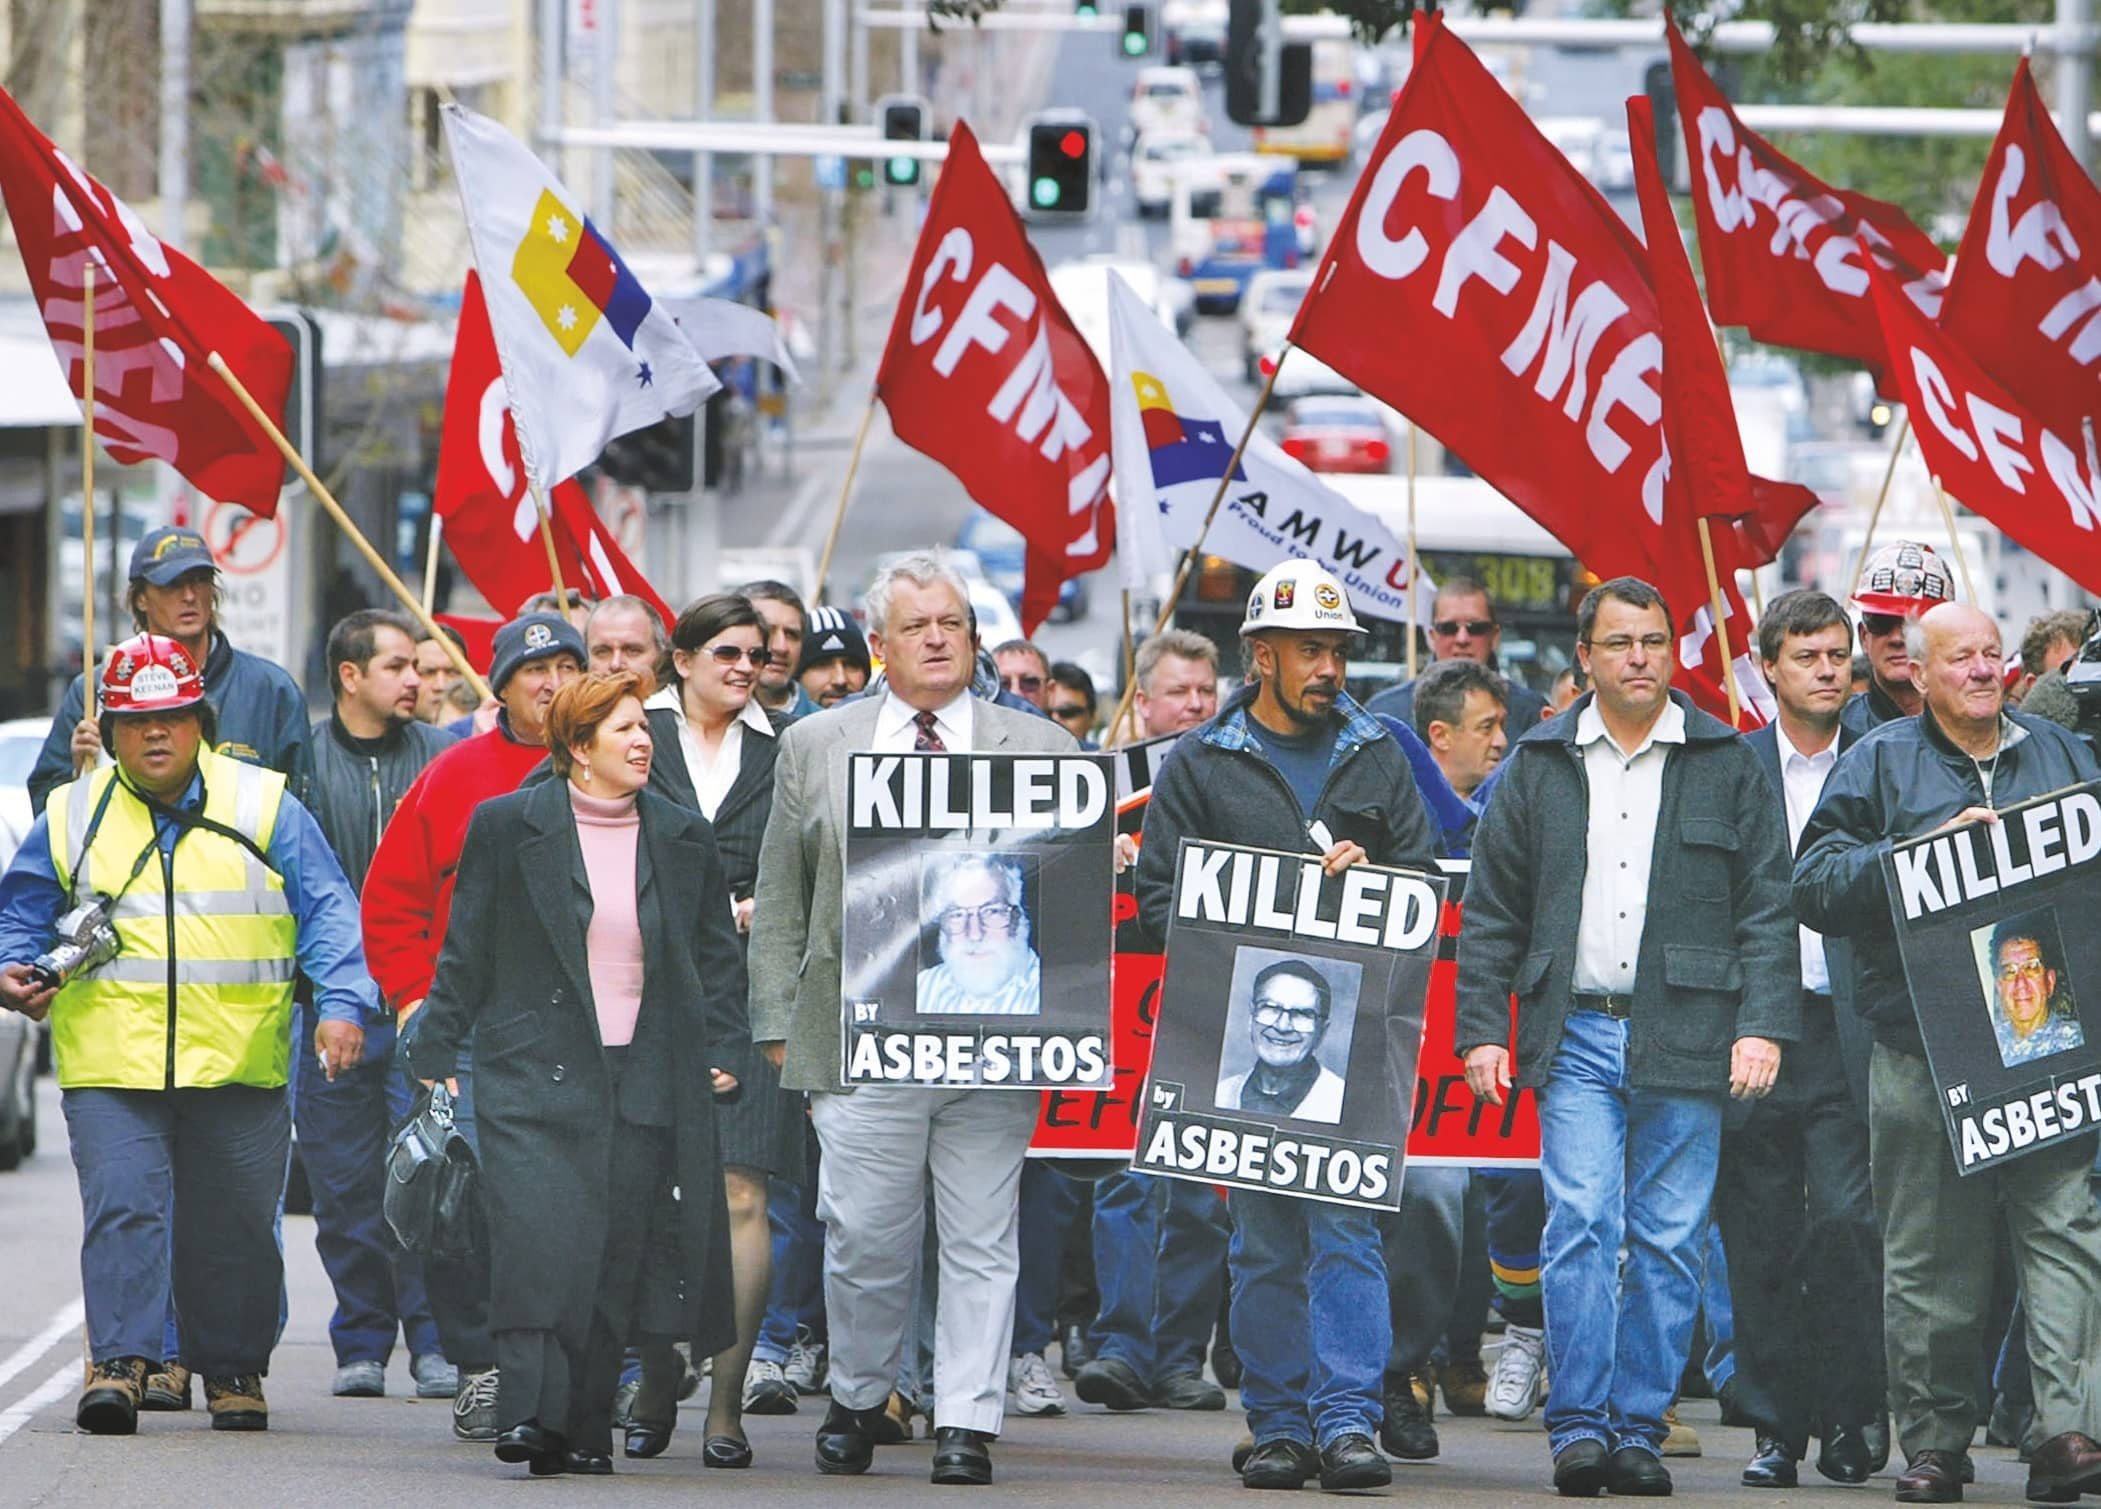 March Against Asbestos